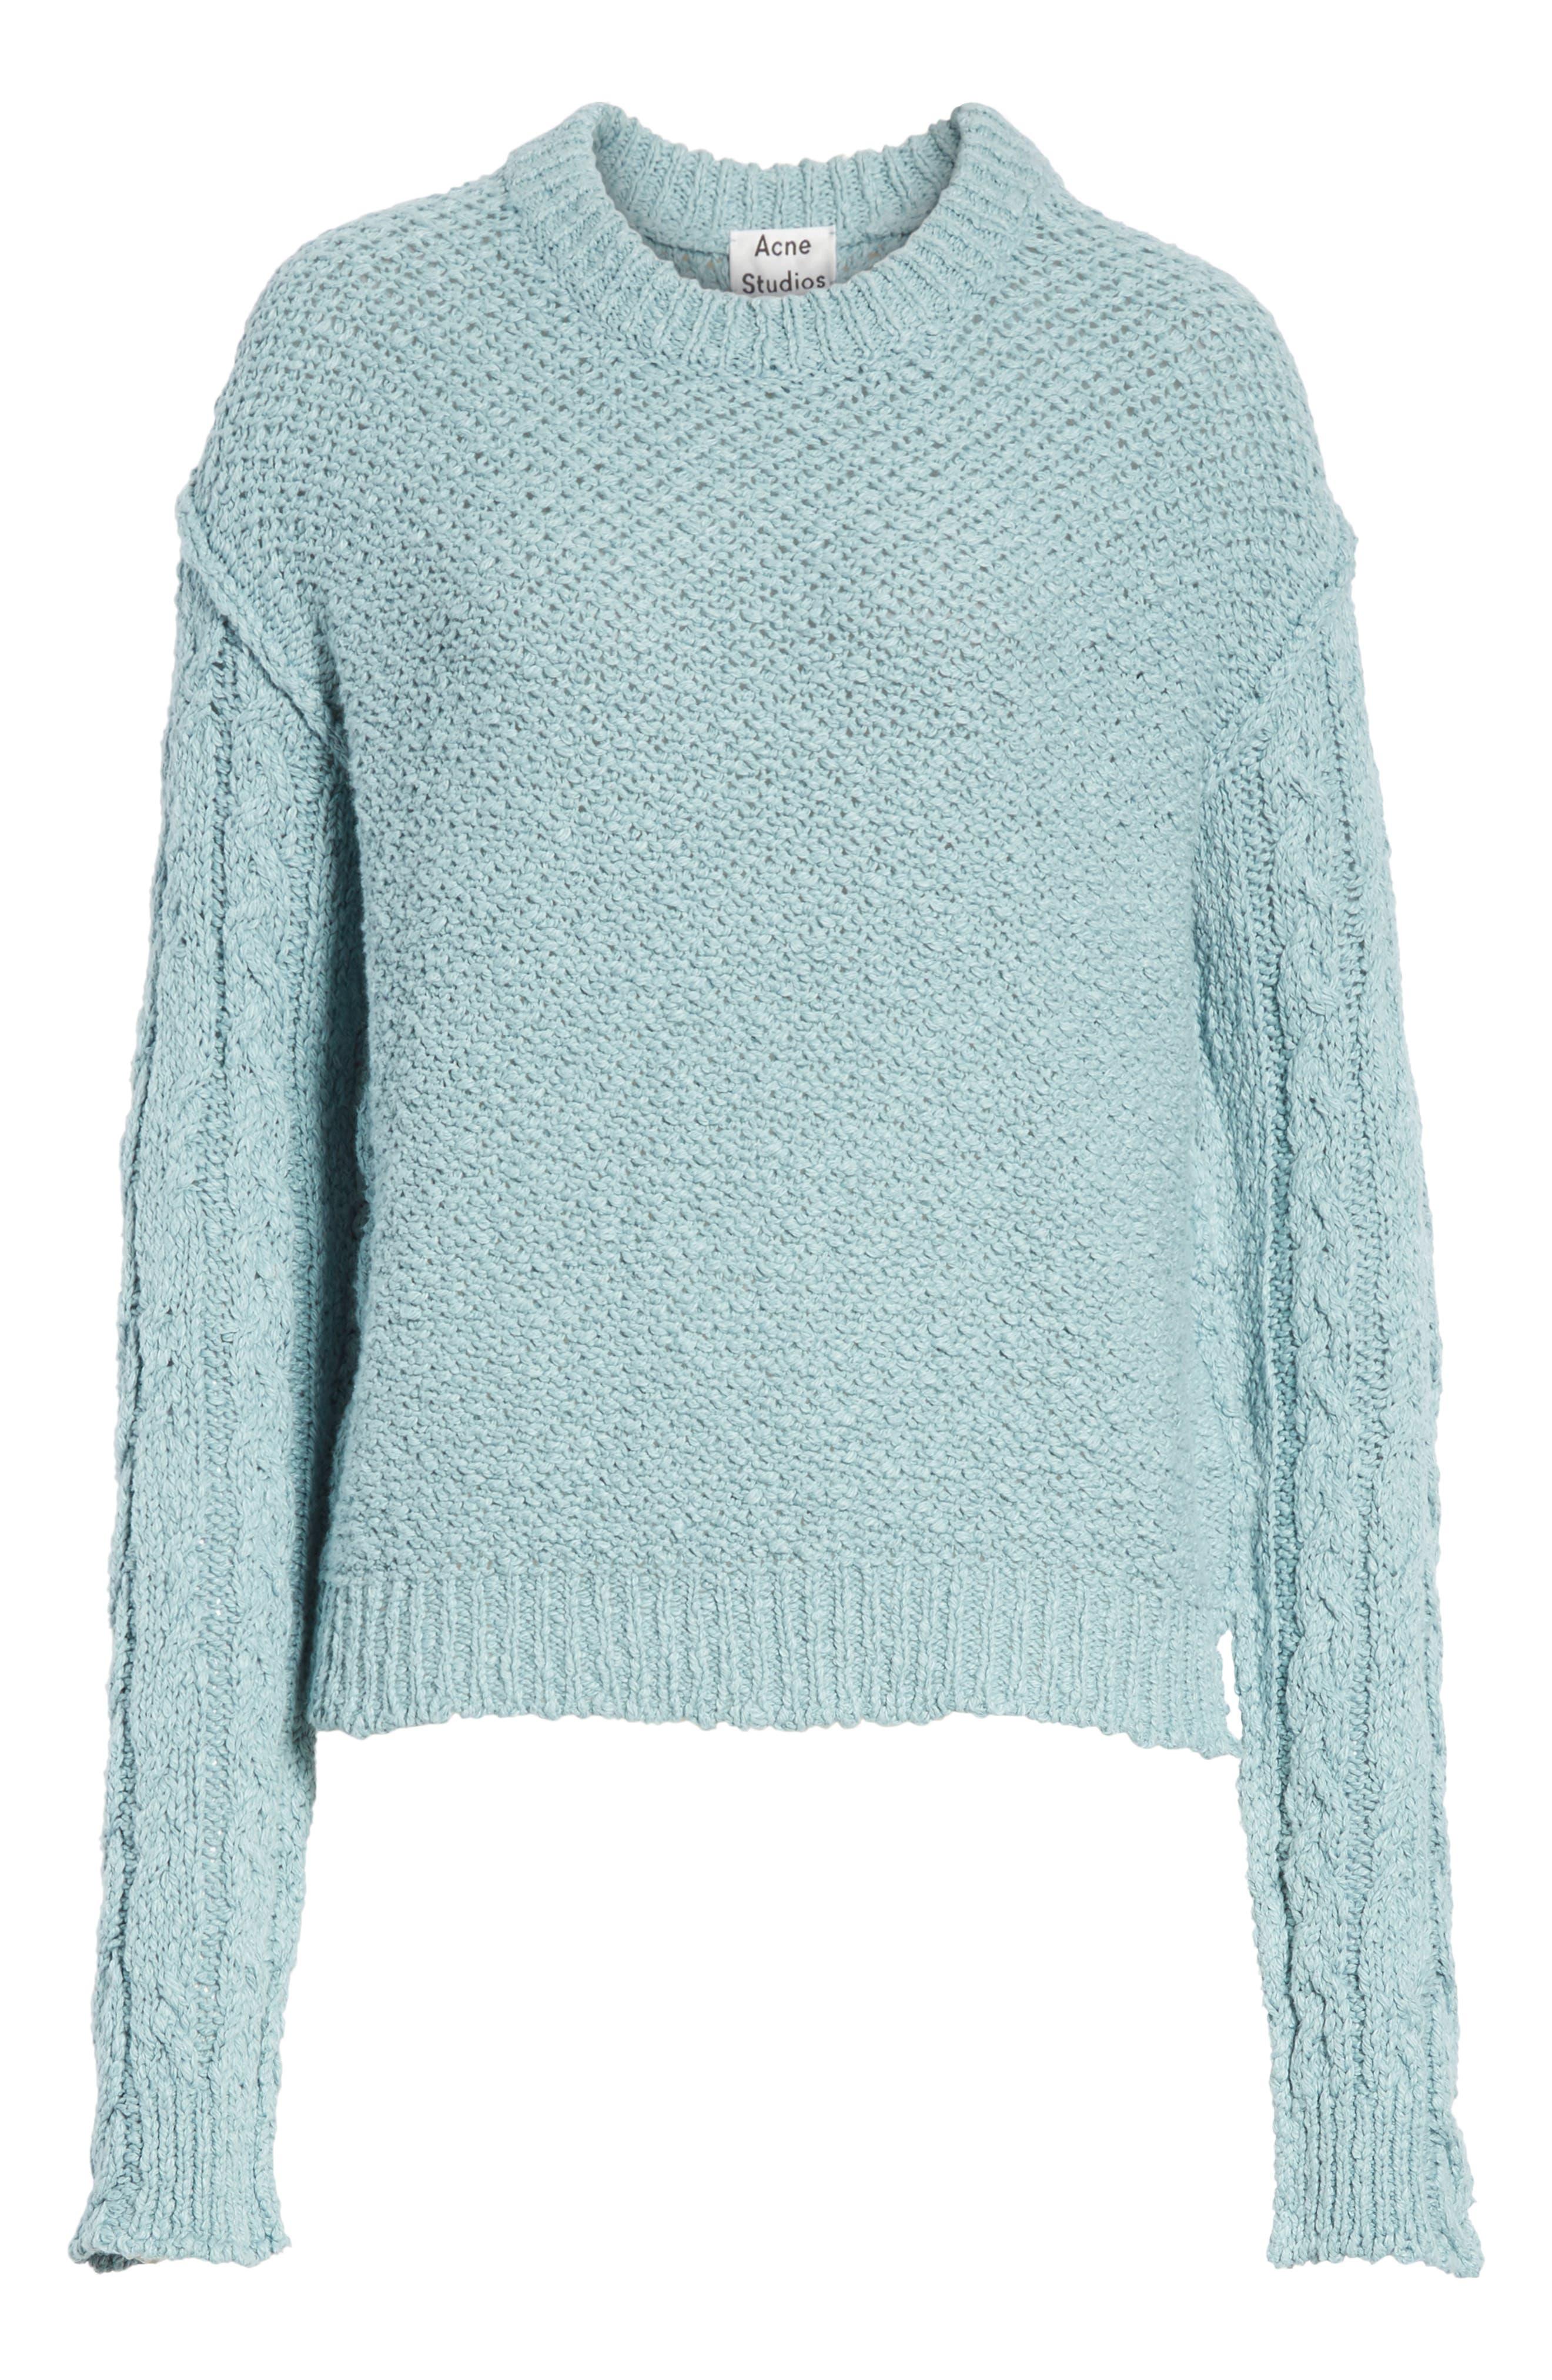 Hila Cable Sleeve Sweater,                         Main,                         color, Blue